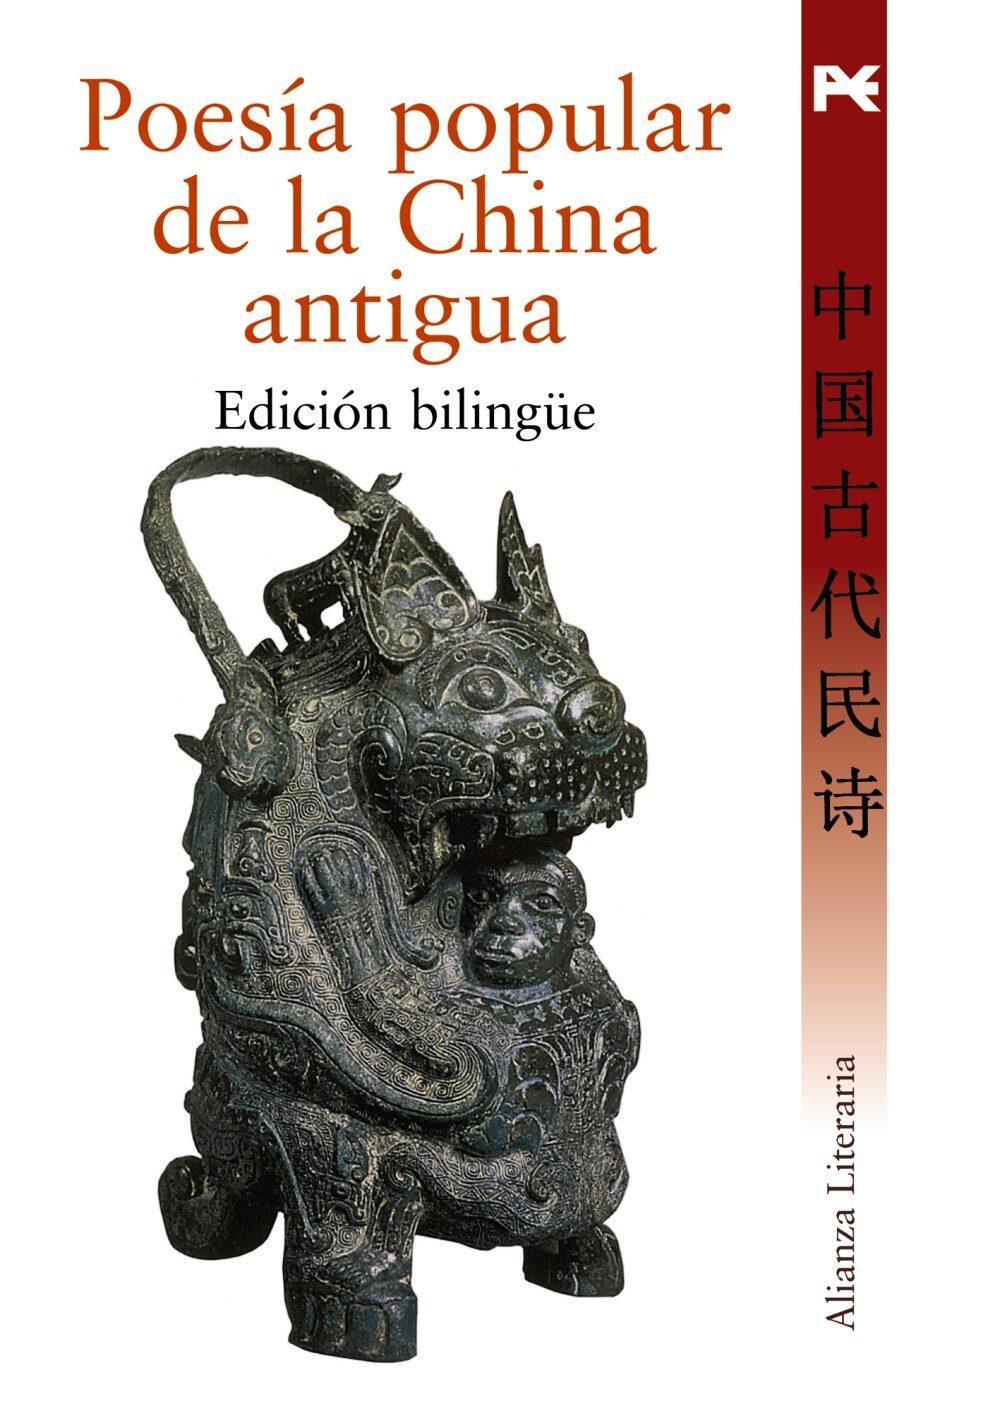 Poesia Popular De La China Antigua por Anonimo